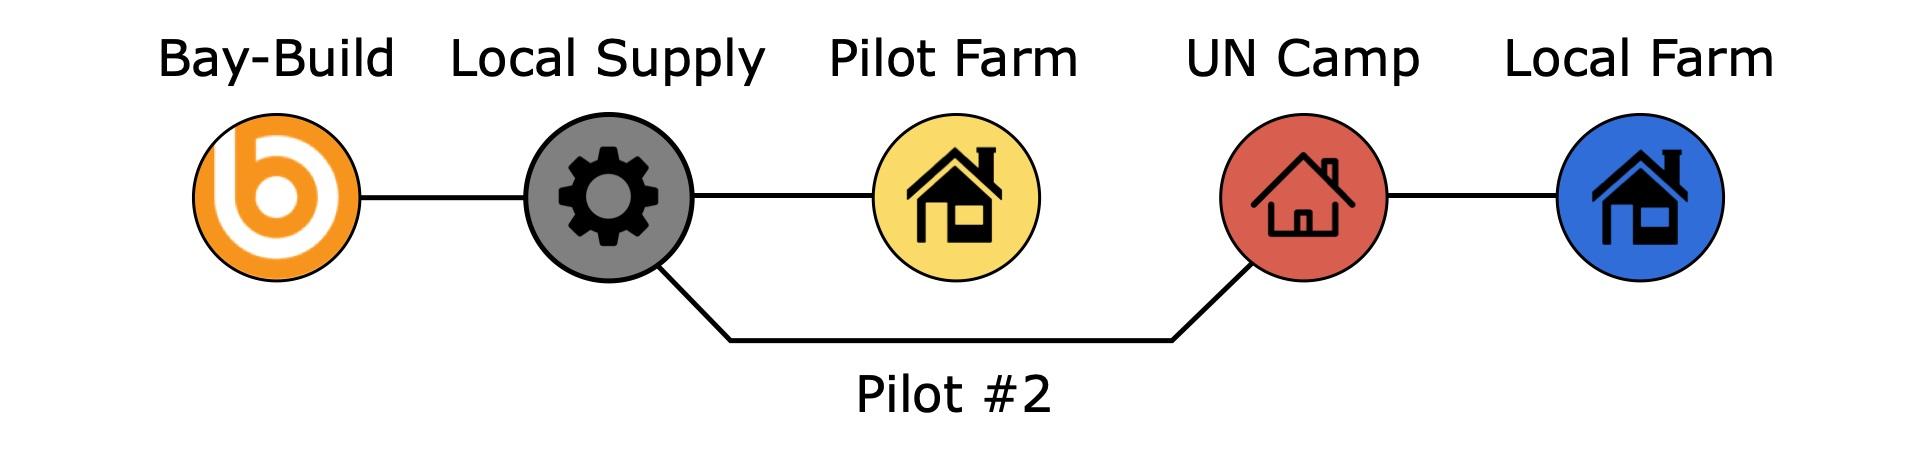 Pilot+Path+2.jpg